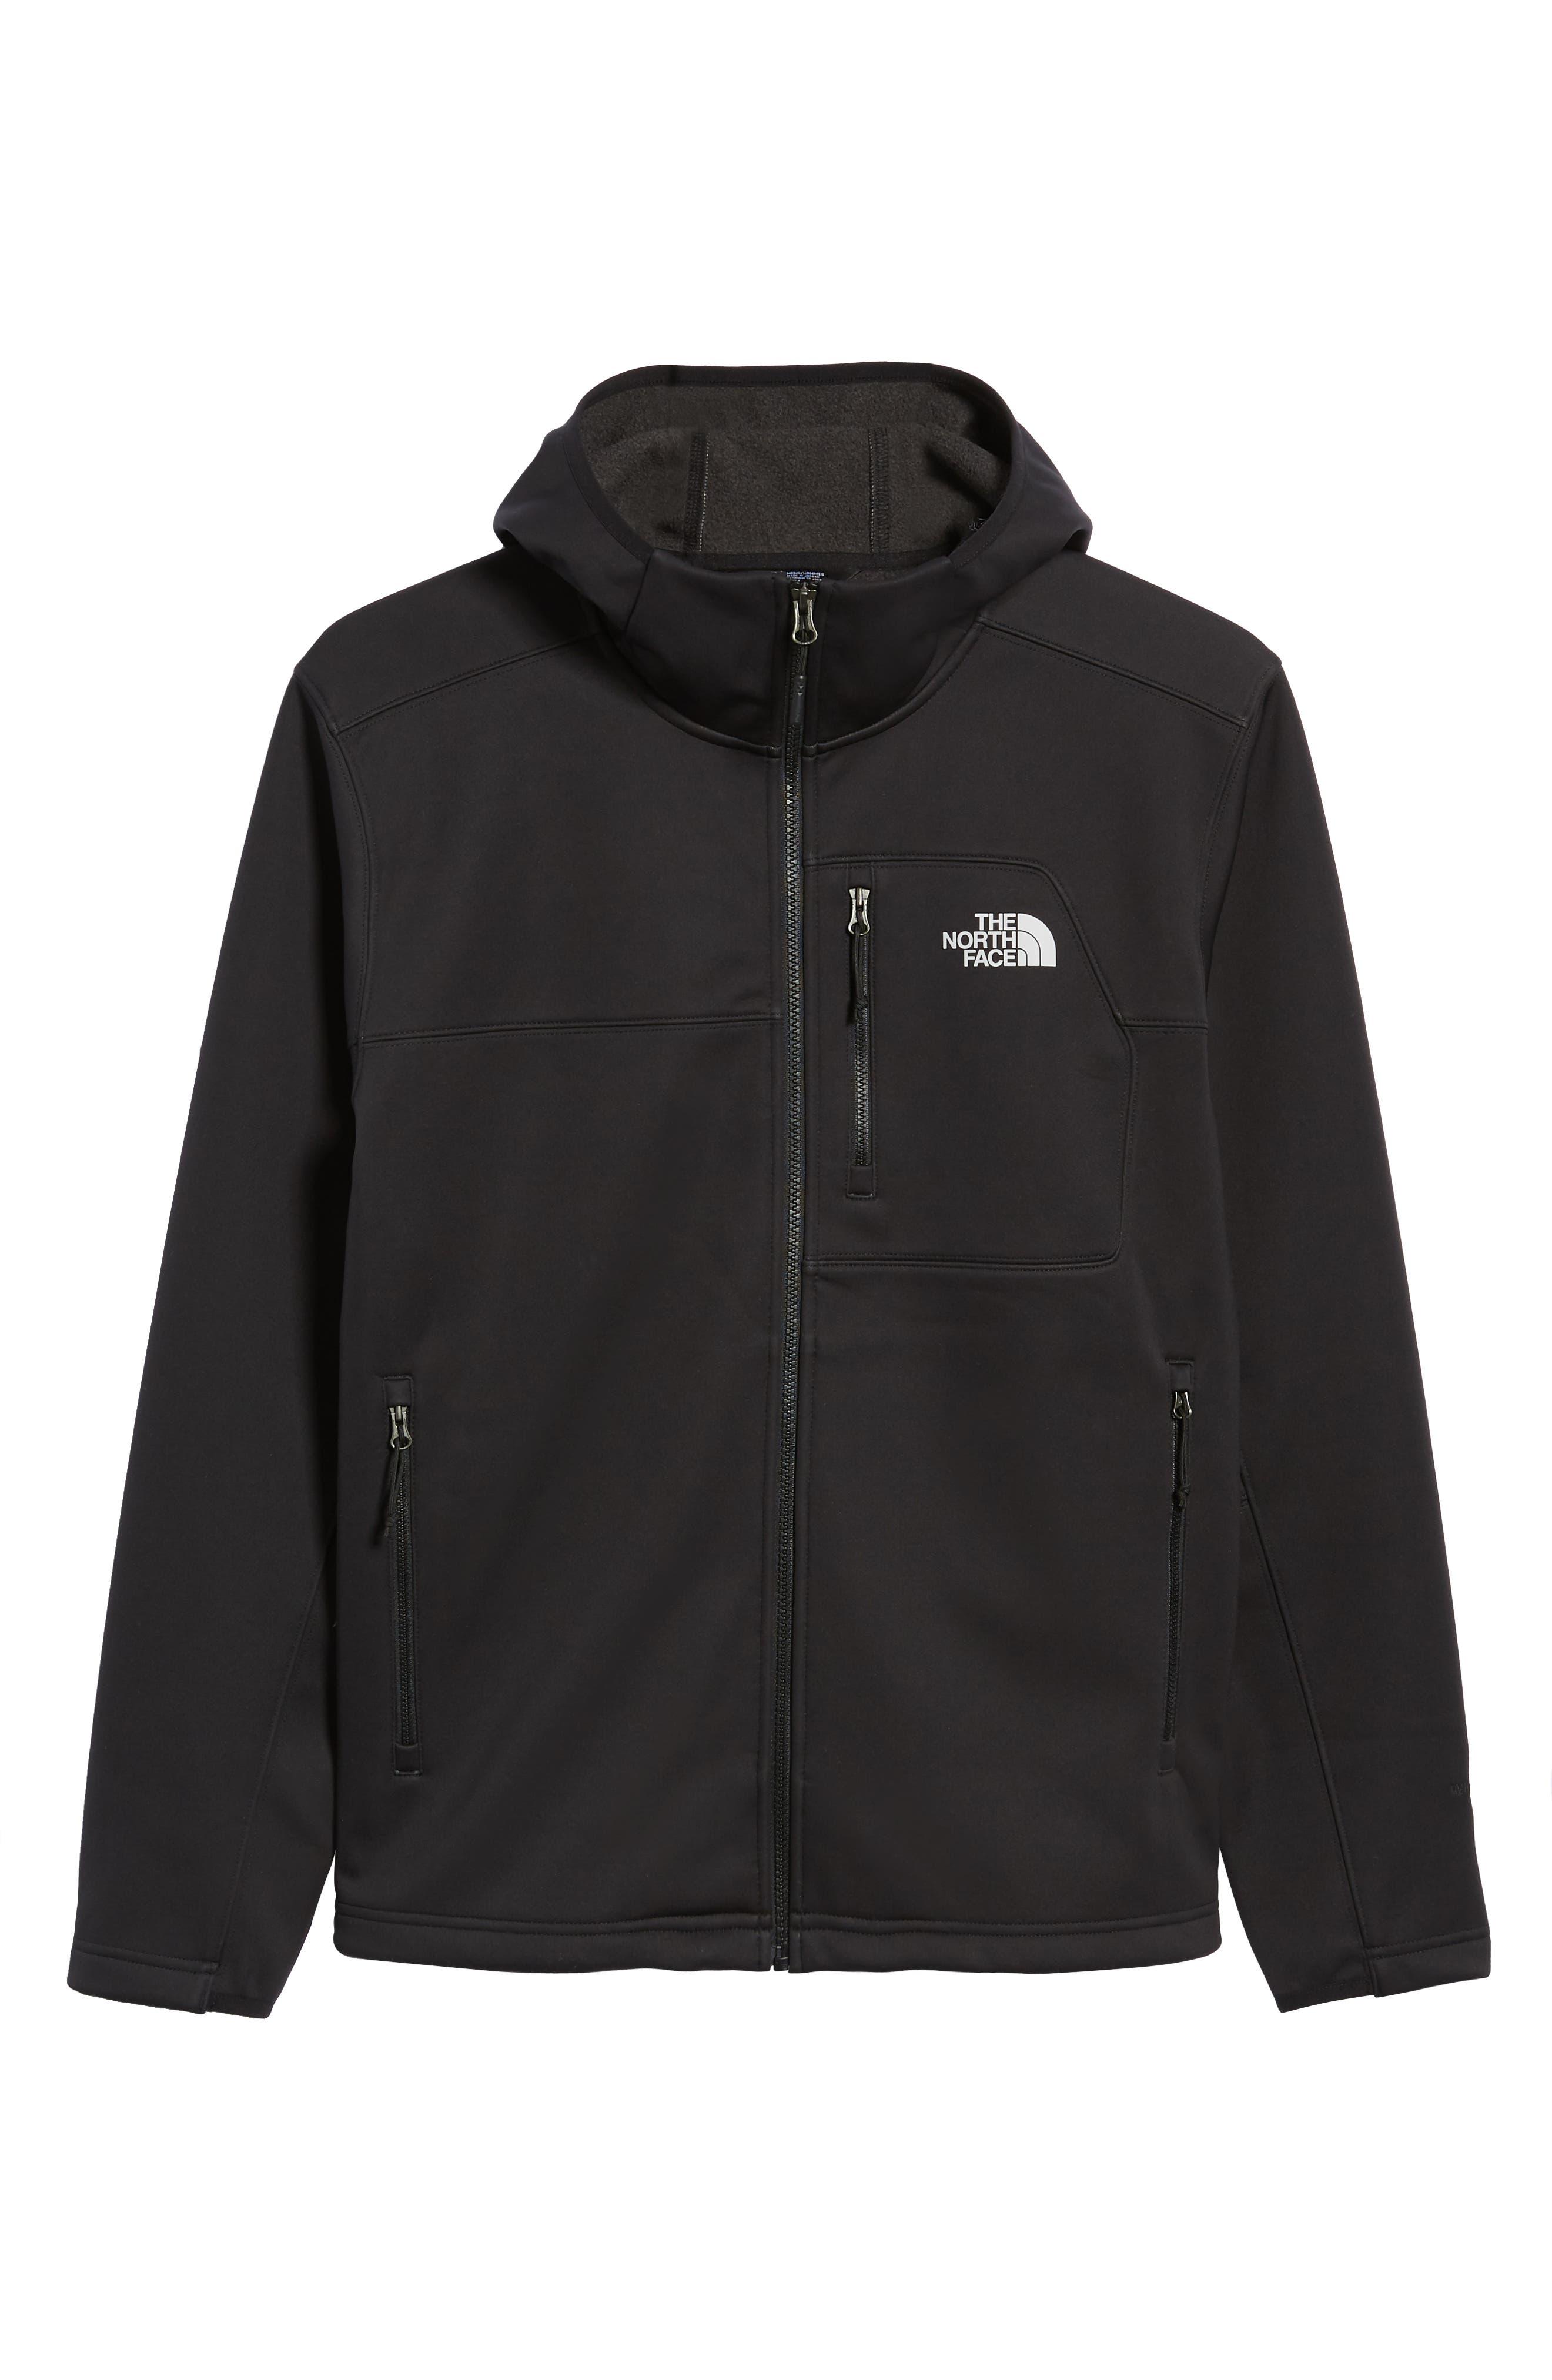 North Face Apex Risor Hooded Jacket,                             Alternate thumbnail 6, color,                             TNF BLACK/ TNF BLACK